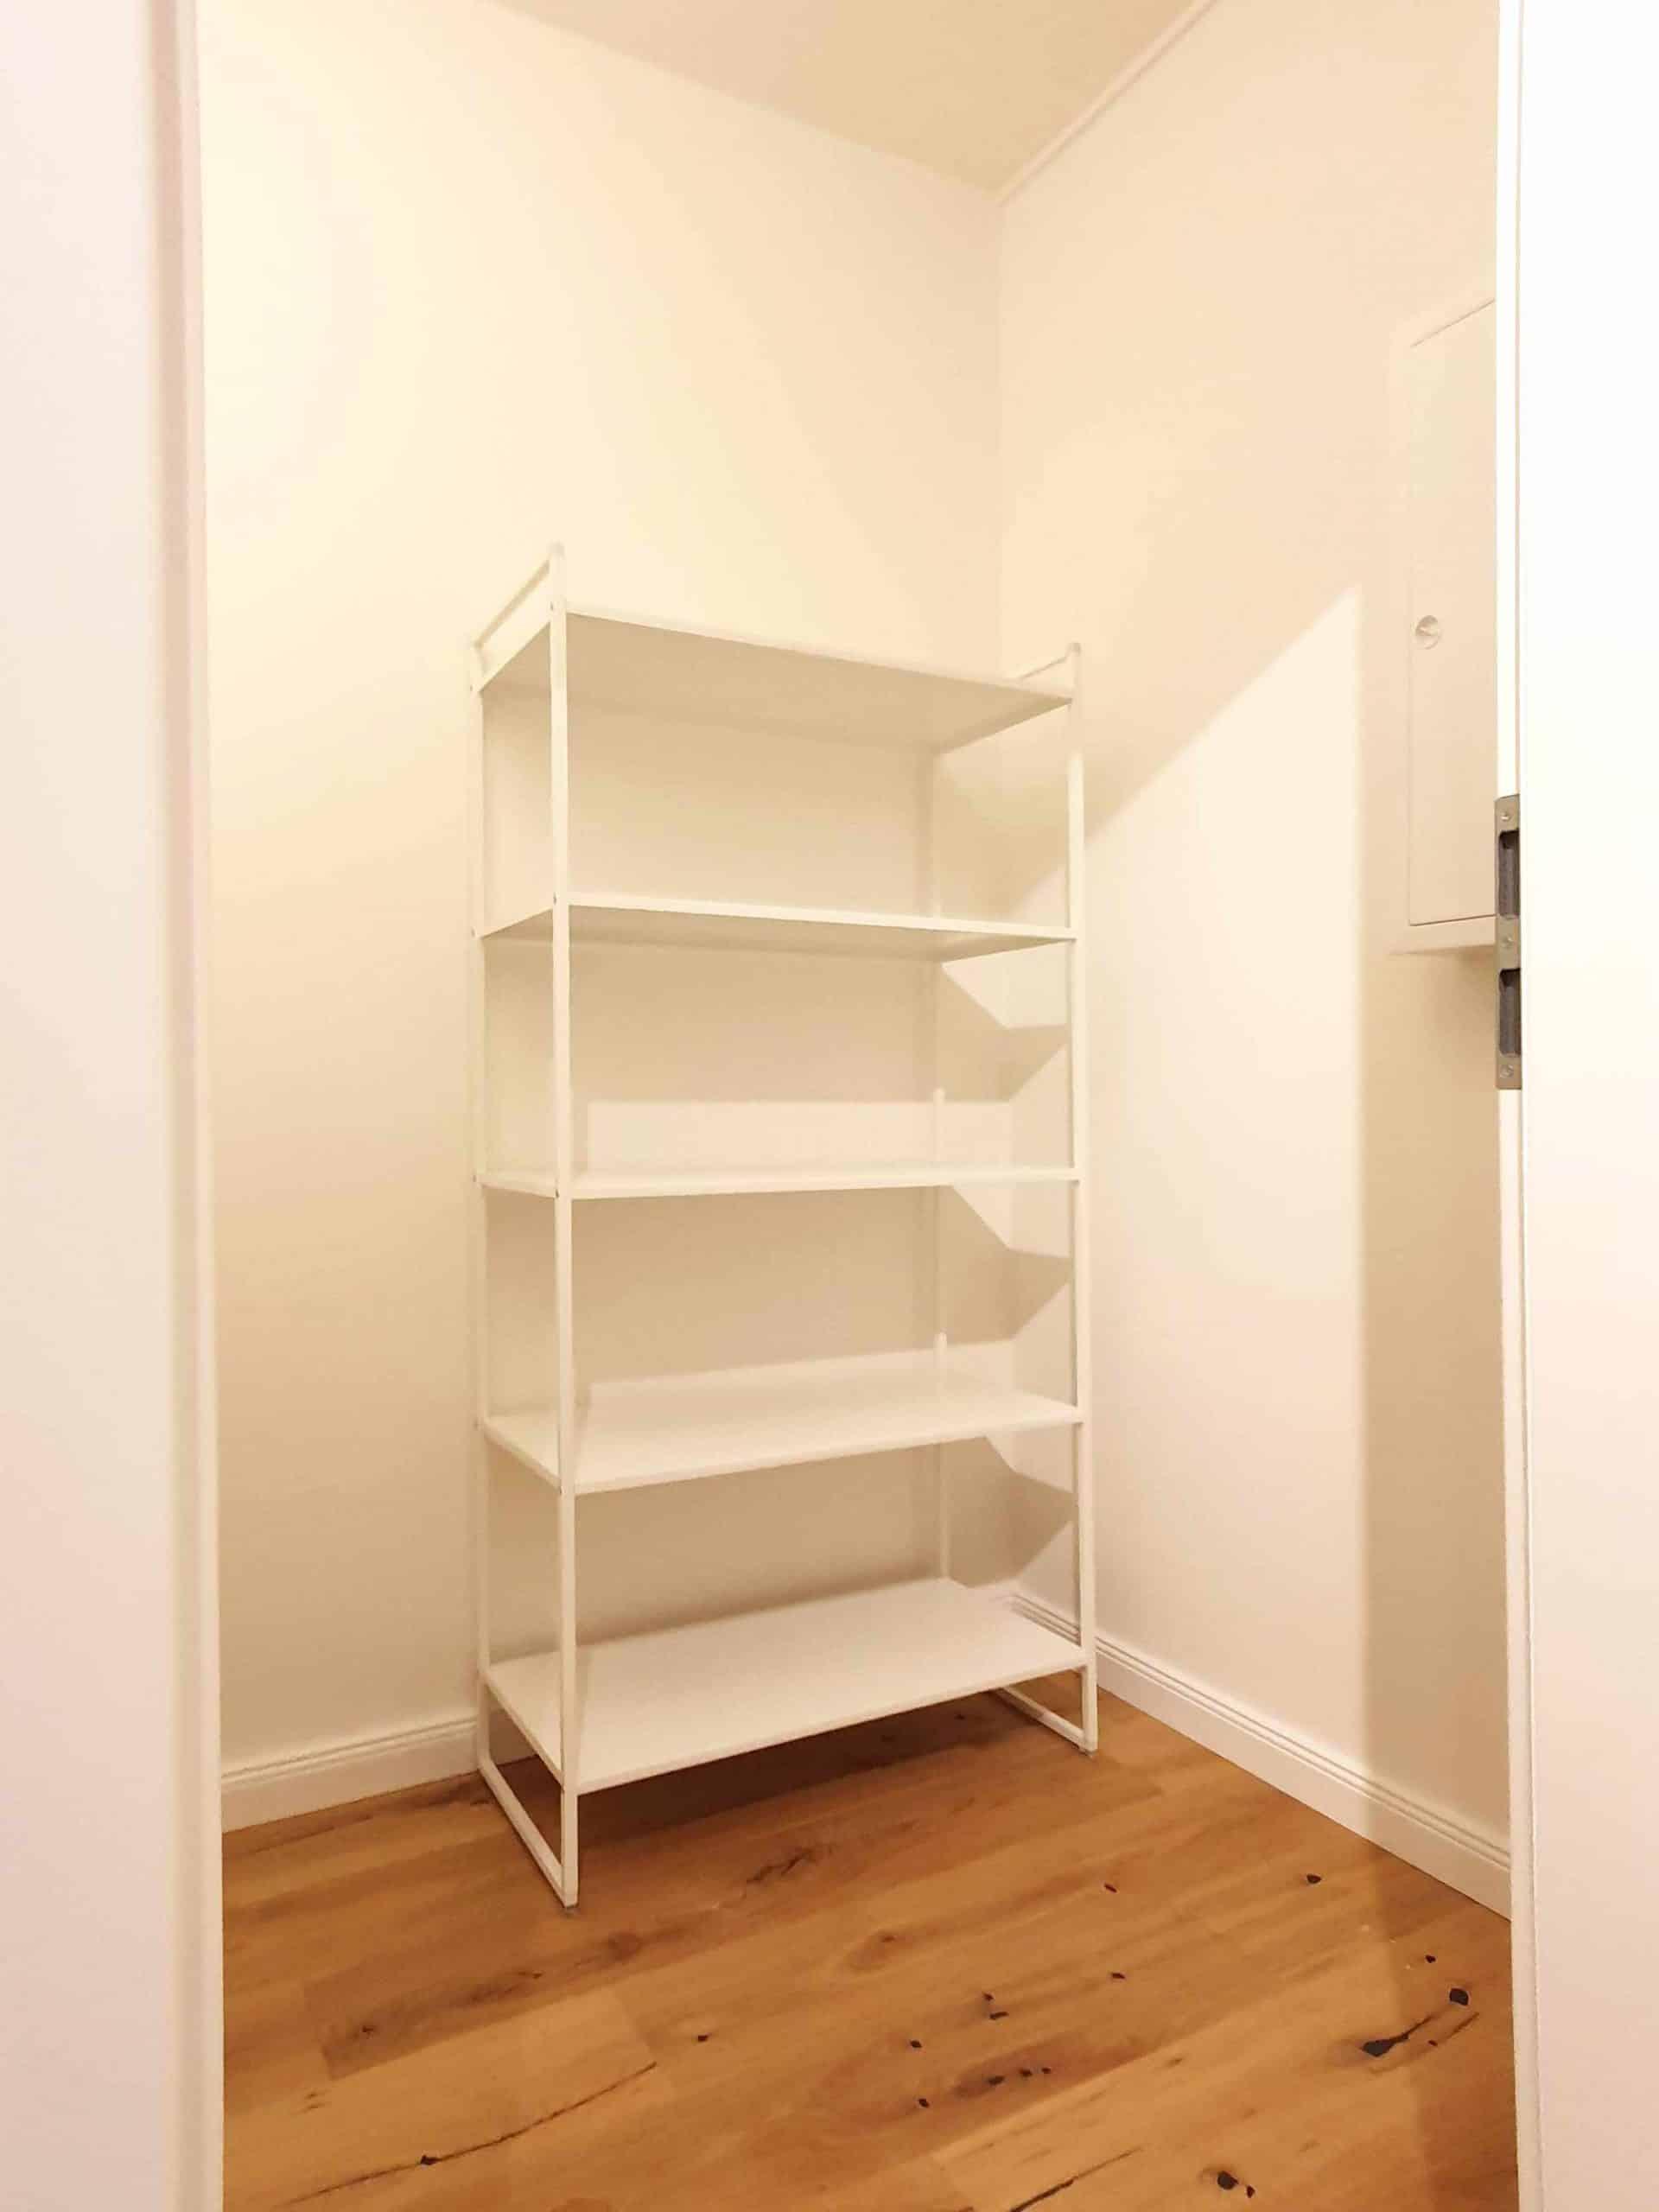 Provisionsfrei: 1 Zimmer Wohnung nahe UKE